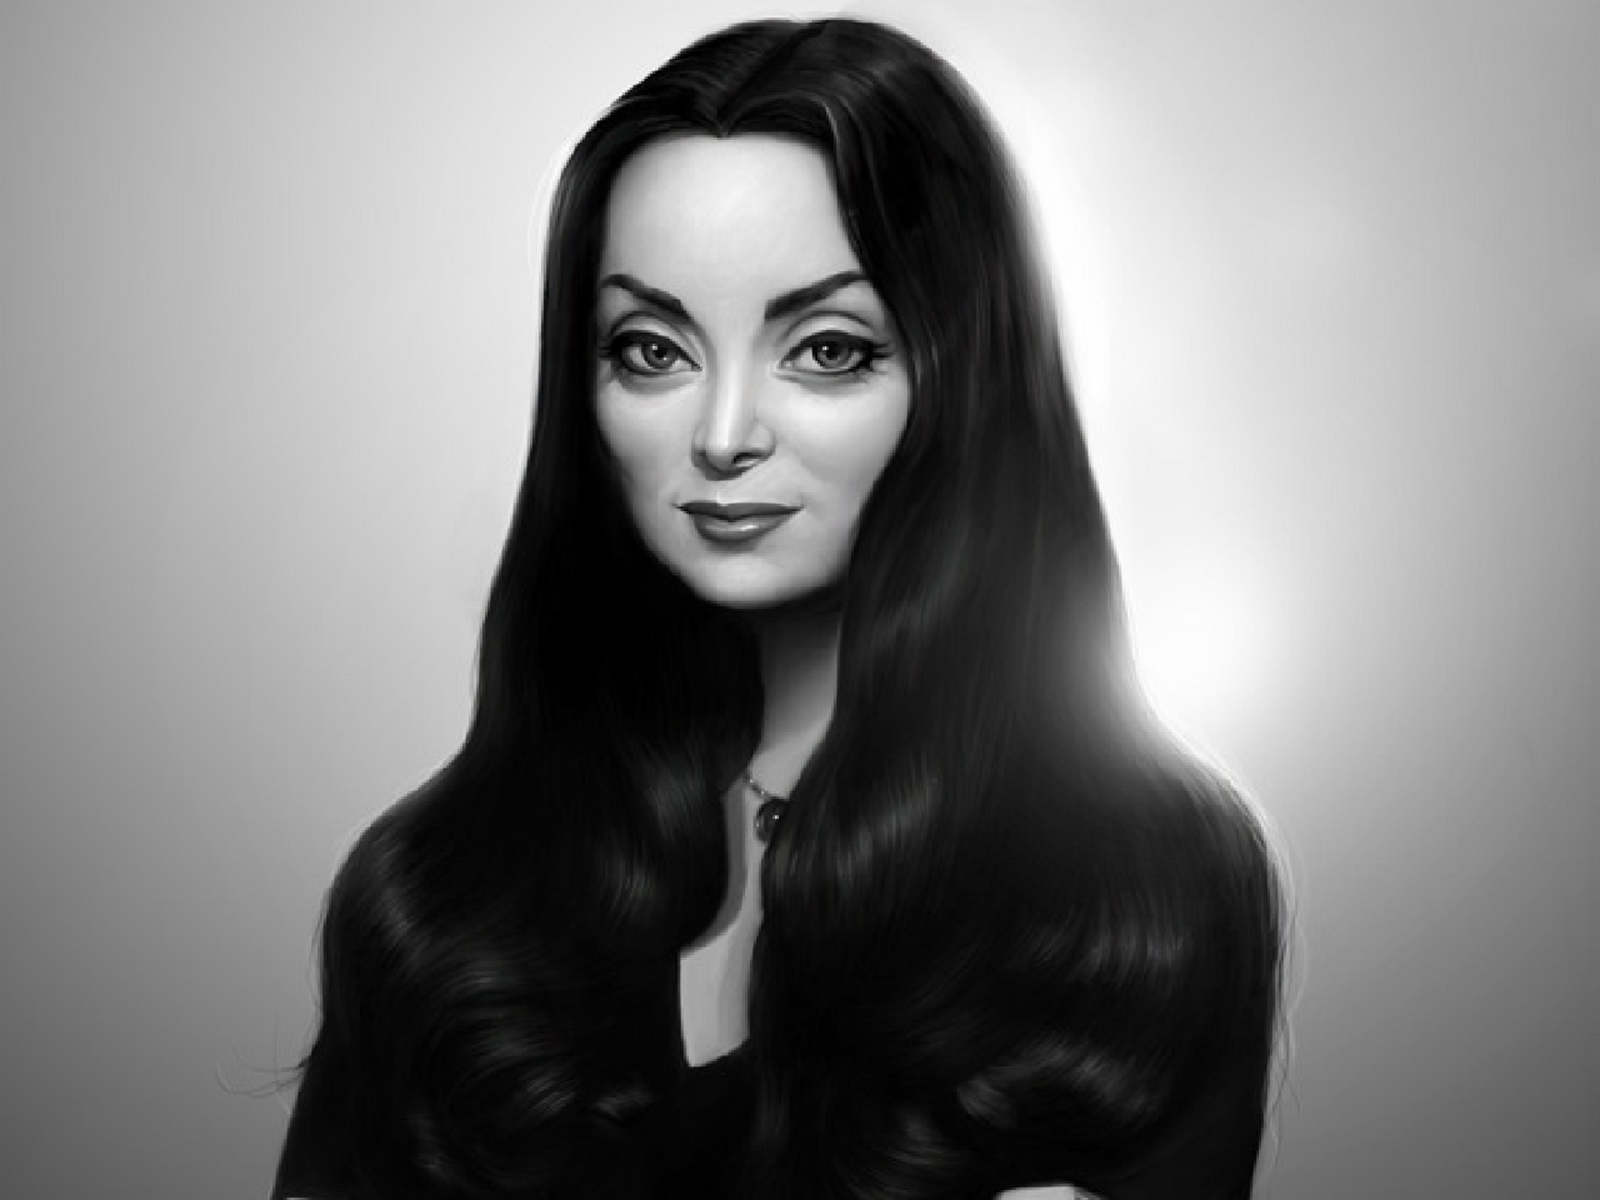 Morticia Addams by myjavier007